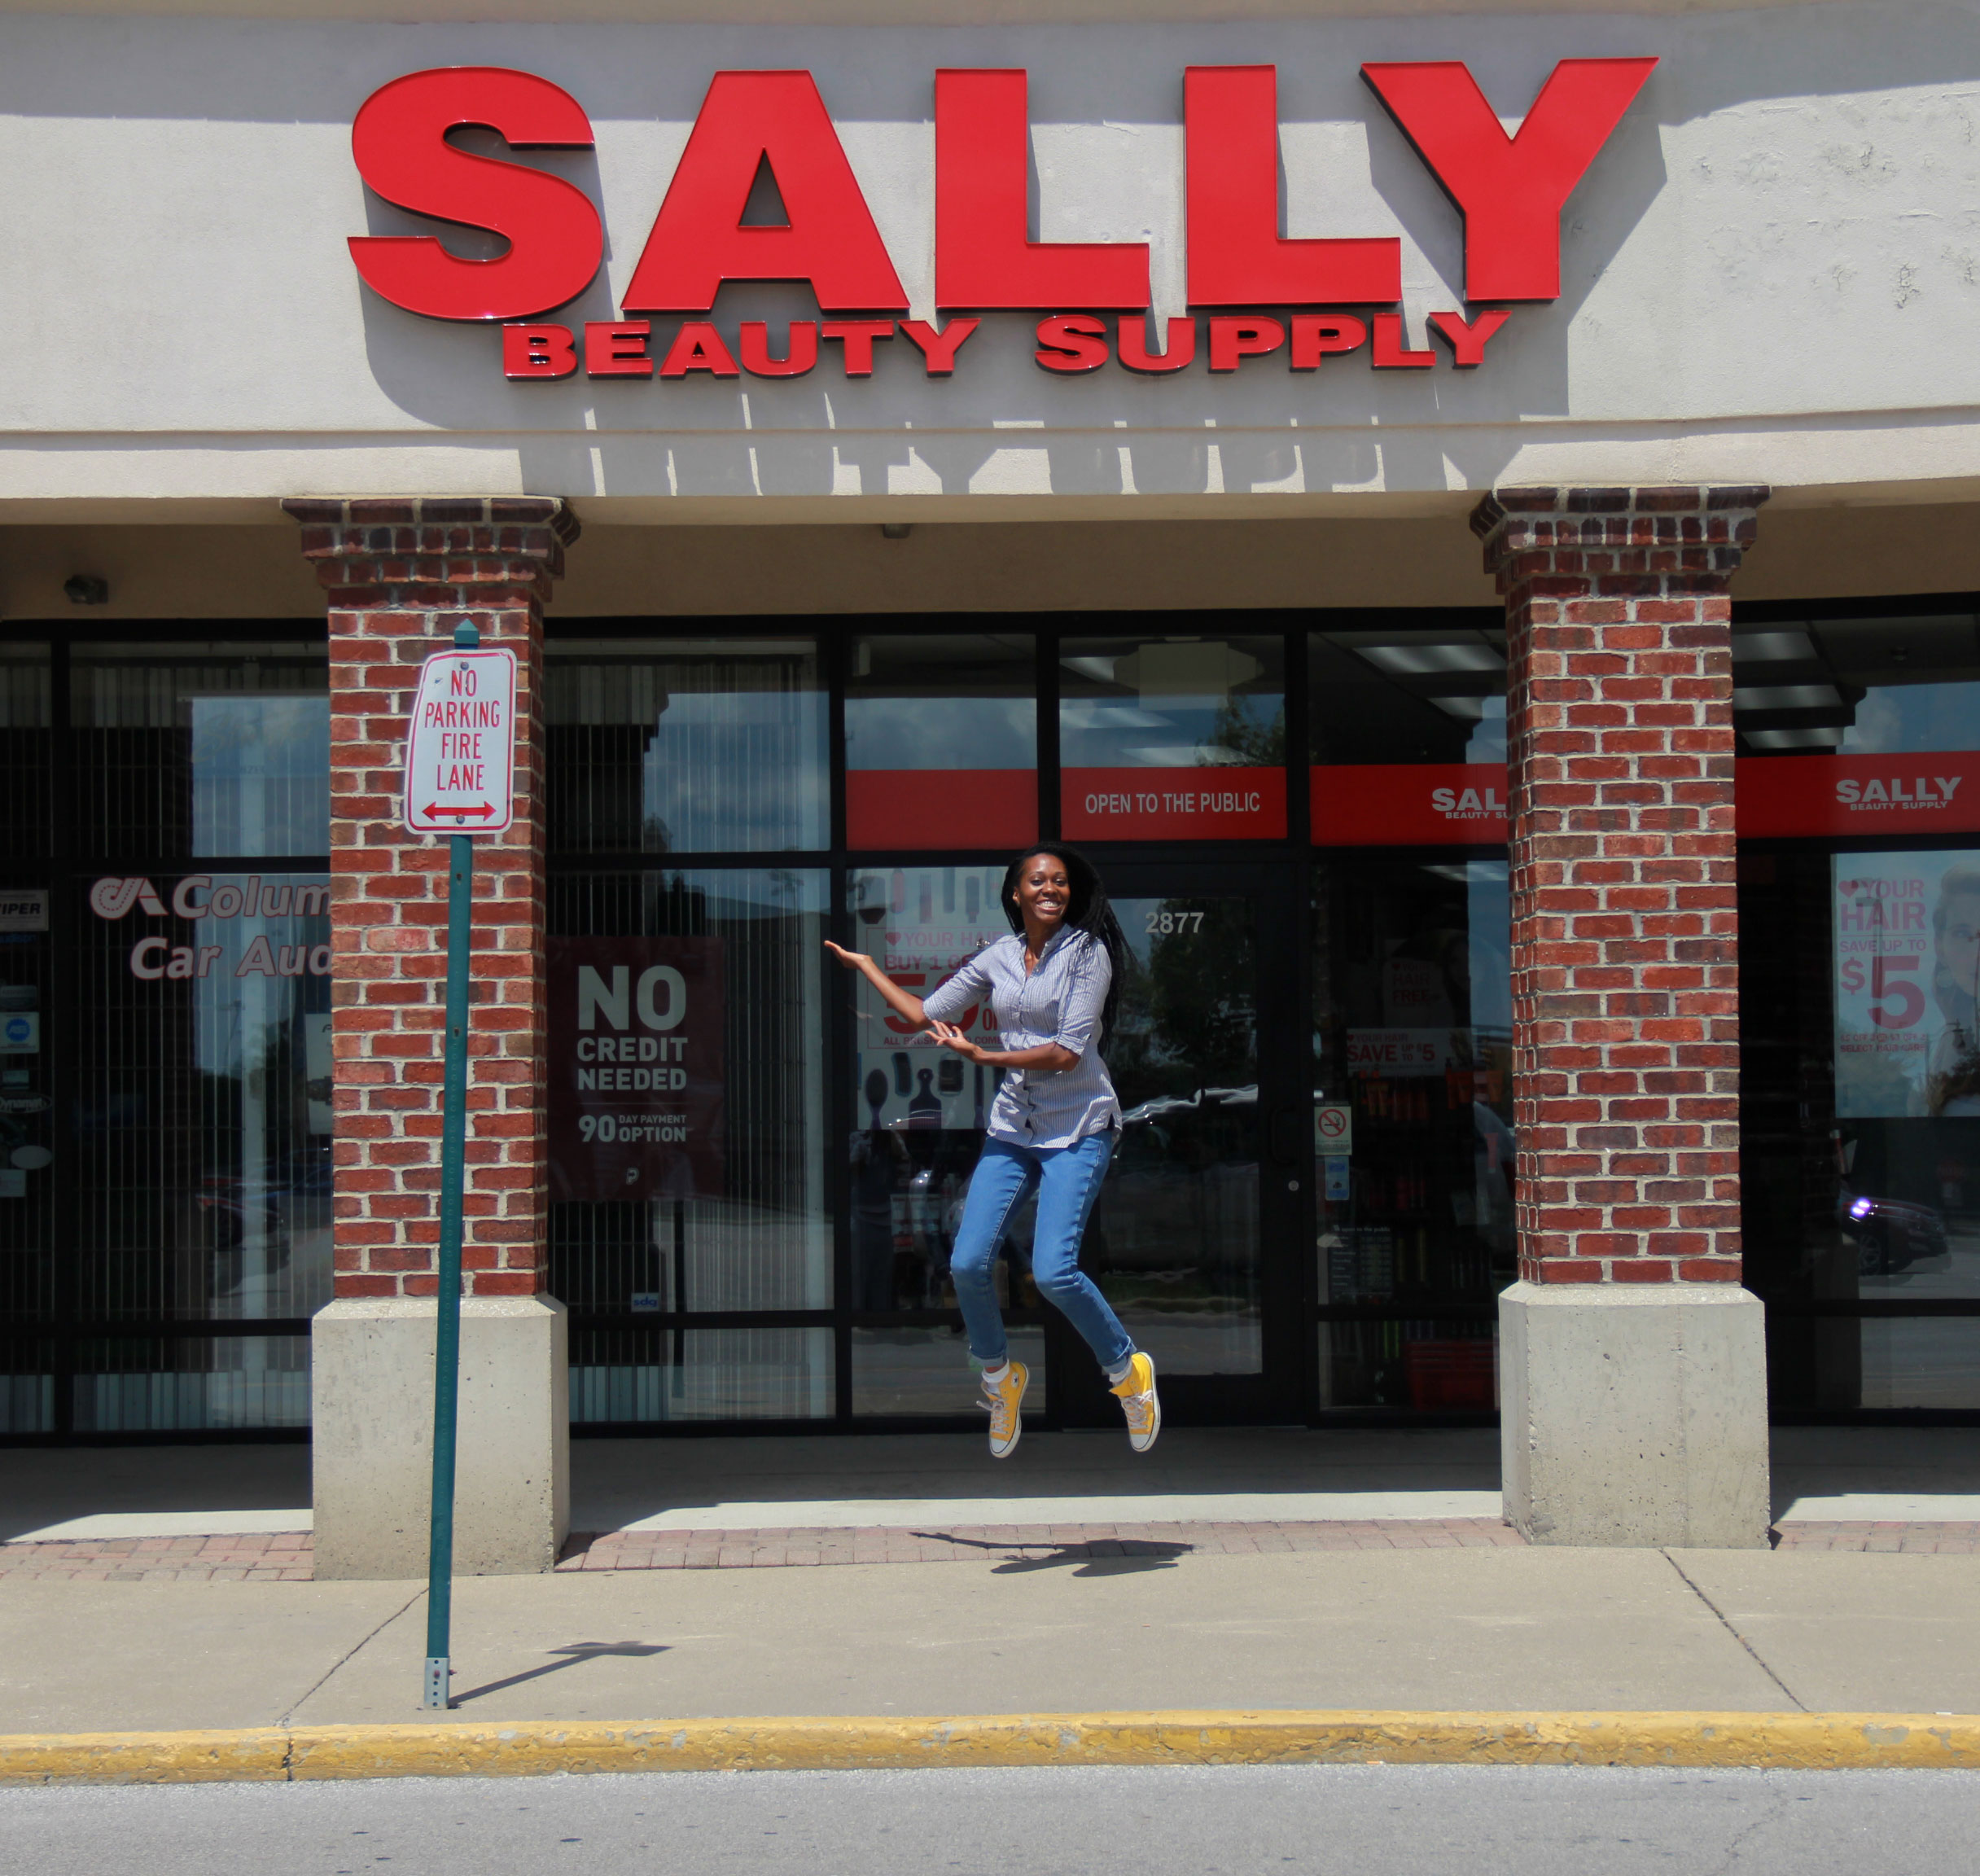 sallys beauty